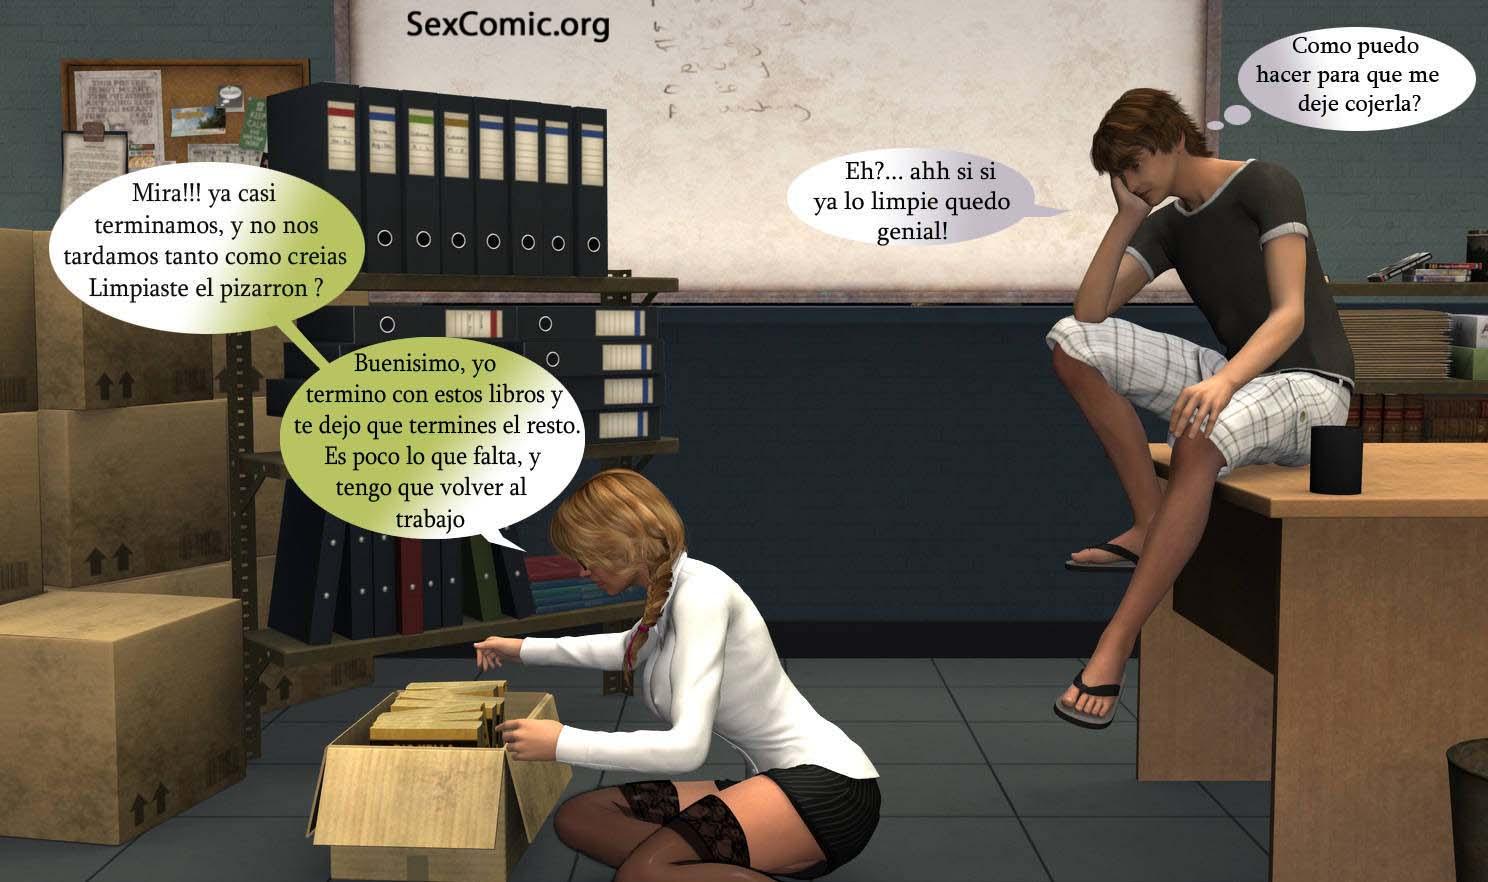 comic-xxx-3d-seduciendo-alas-empleadas-de-mama-historias-sexuales-mangas-para-adultos-videos-deincesto-comics-xxx-historias-eroticas-fantacias-sexuales-gtaris-online-33